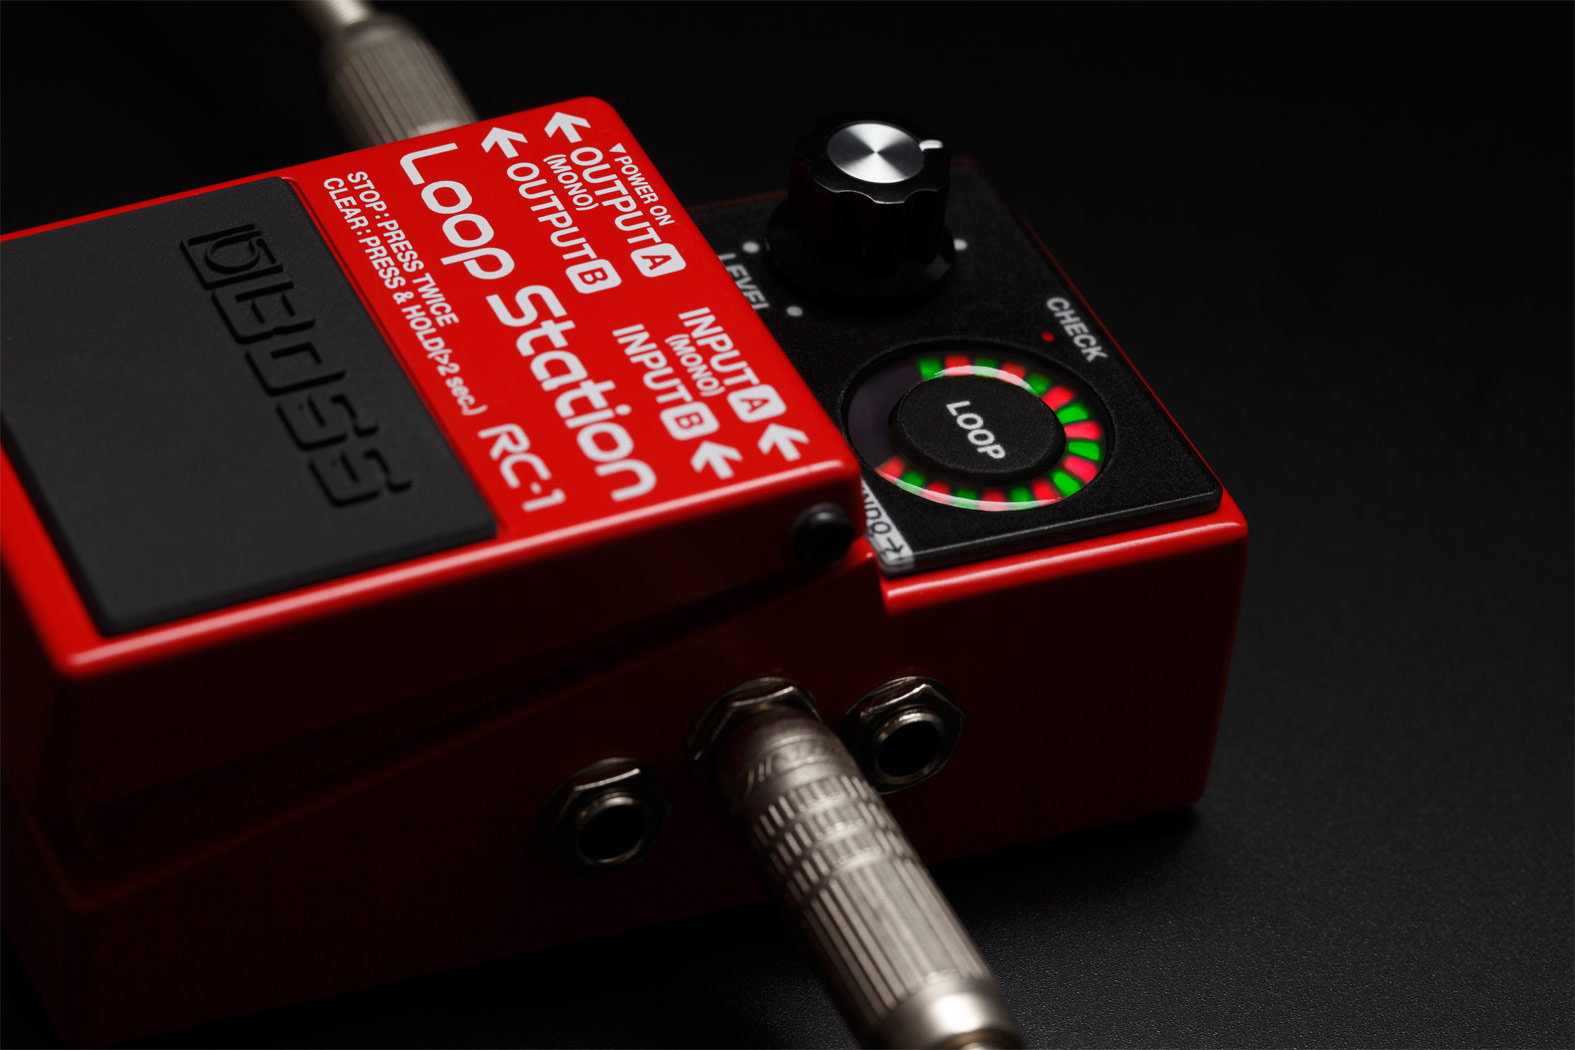 Best Looper Pedal 2021 12 best looper pedals to buy in 2019 | Guitar.| All Things Guitar